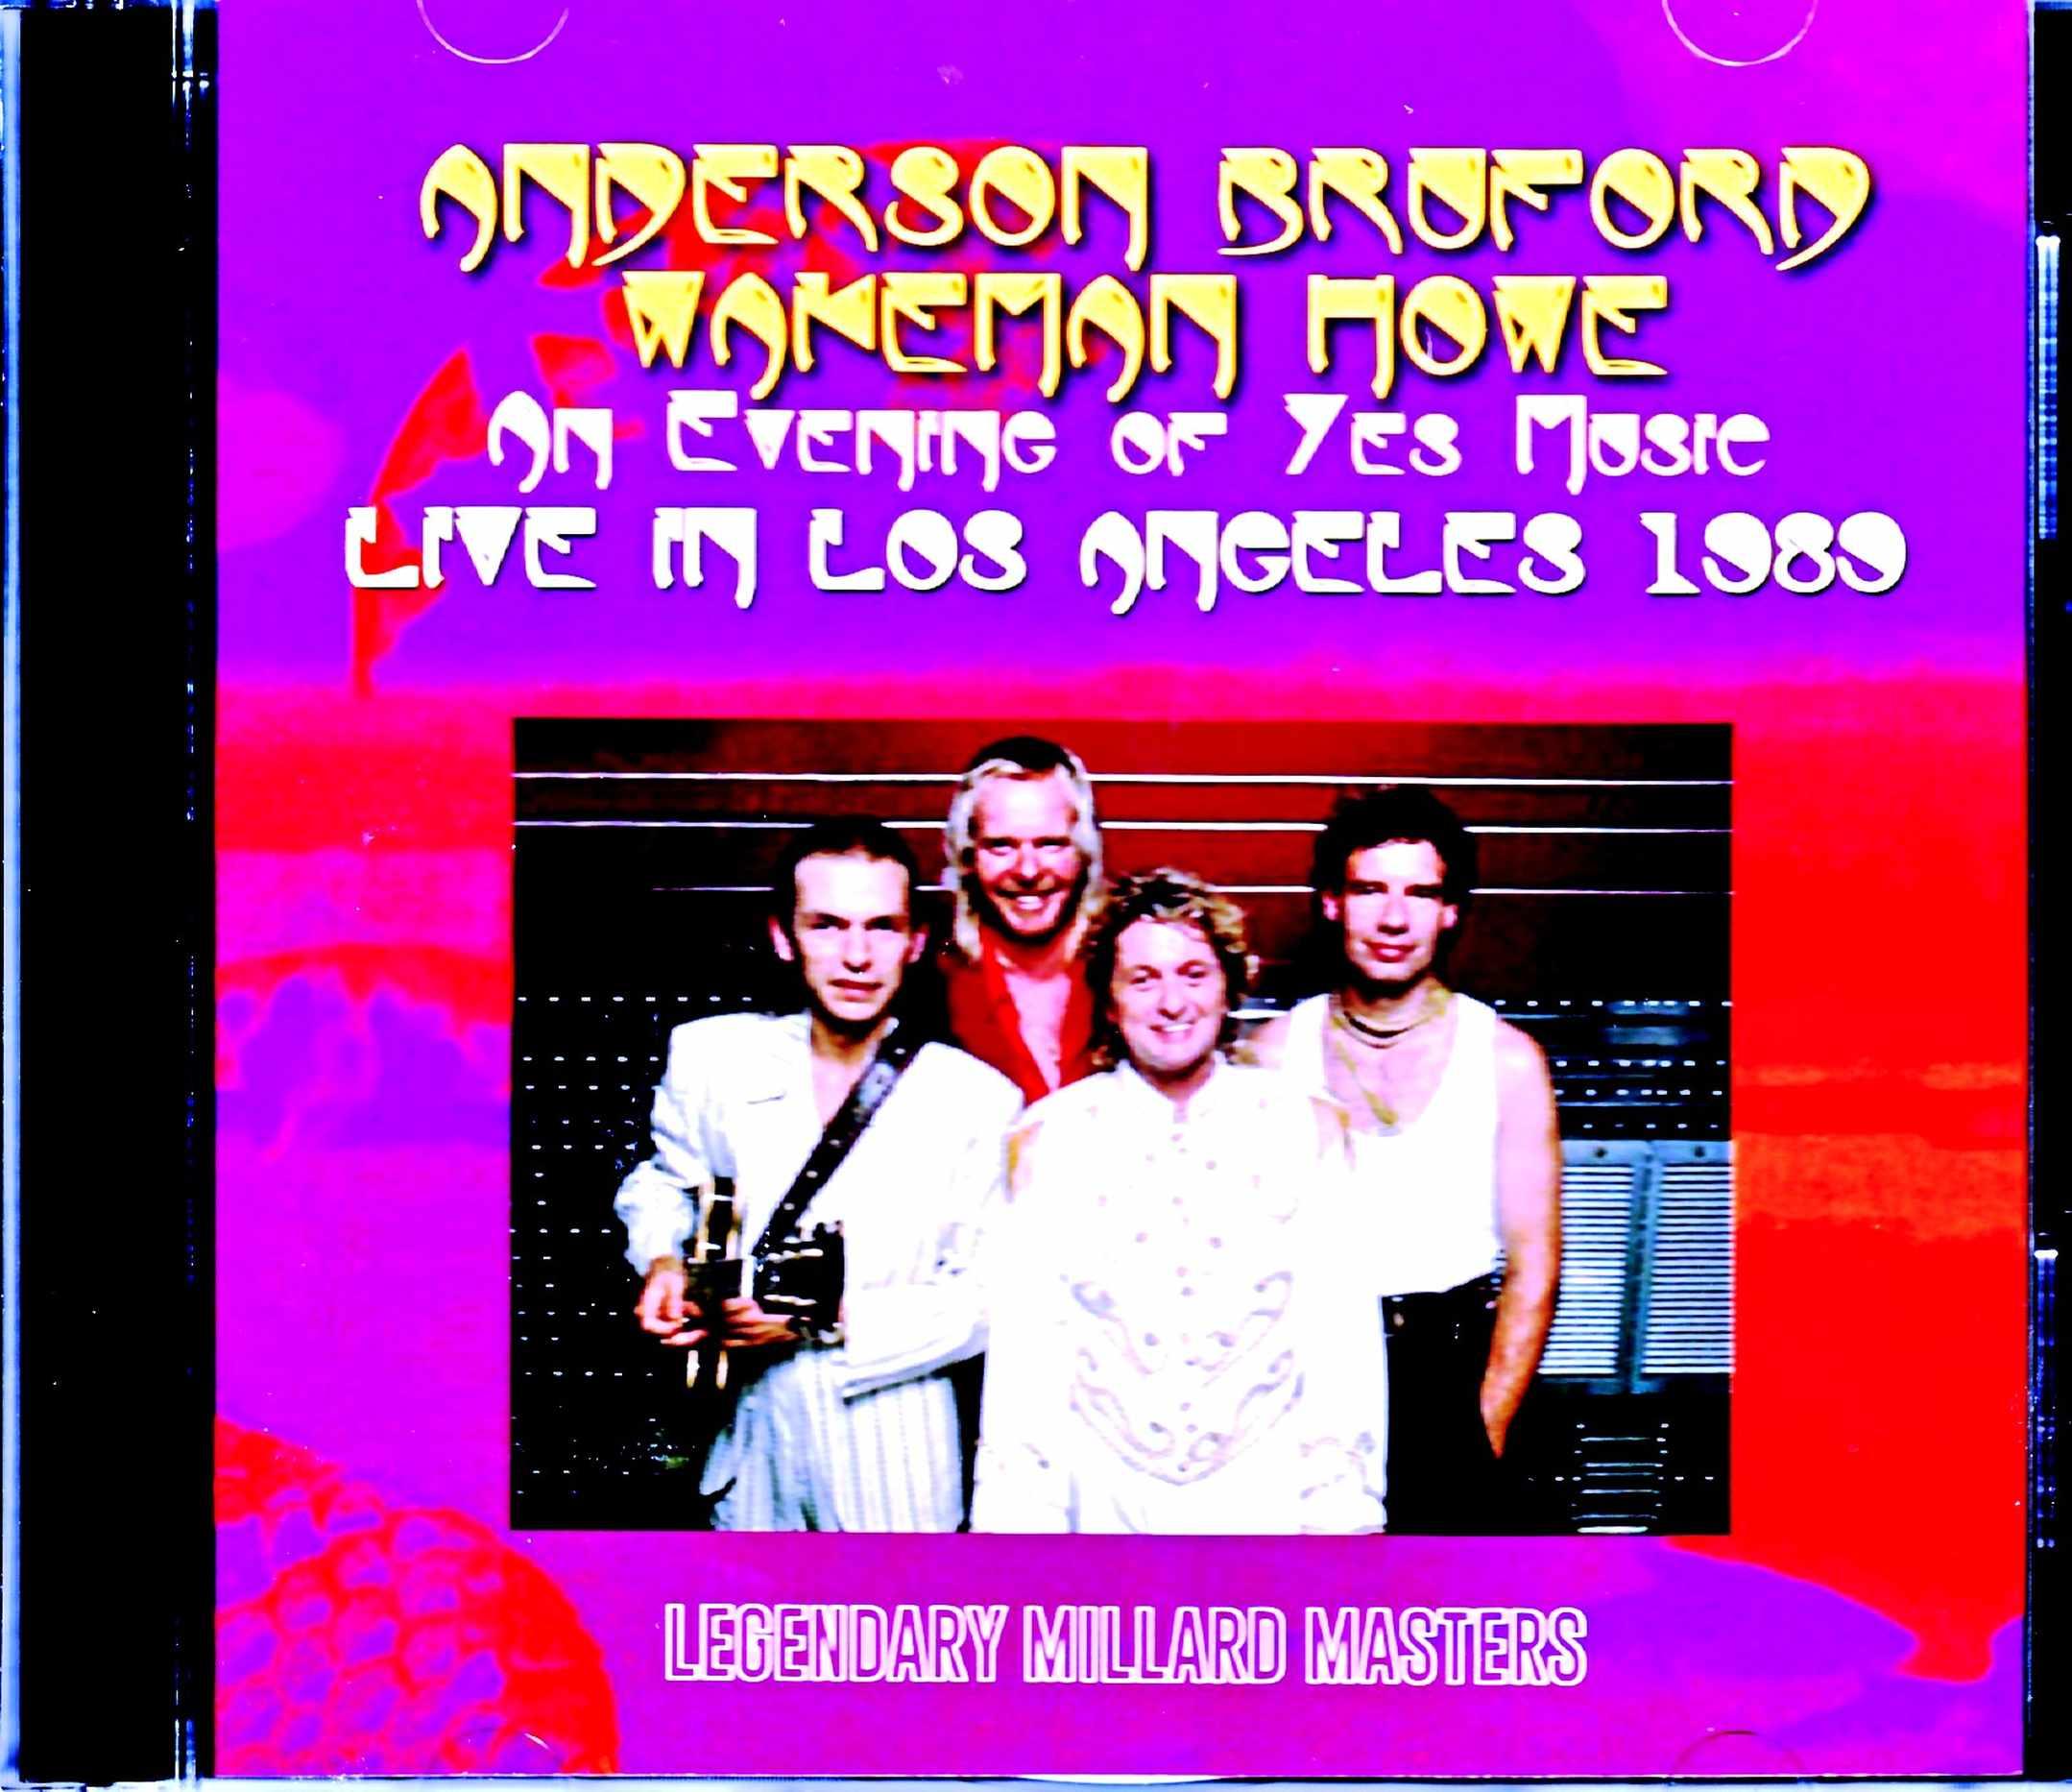 Anderson Bruford Wakeman Howe アンダーソン・ブラフォード ・ウェイクマン・ハウ/CA,USA 1989 Mike Millard Master Tapes